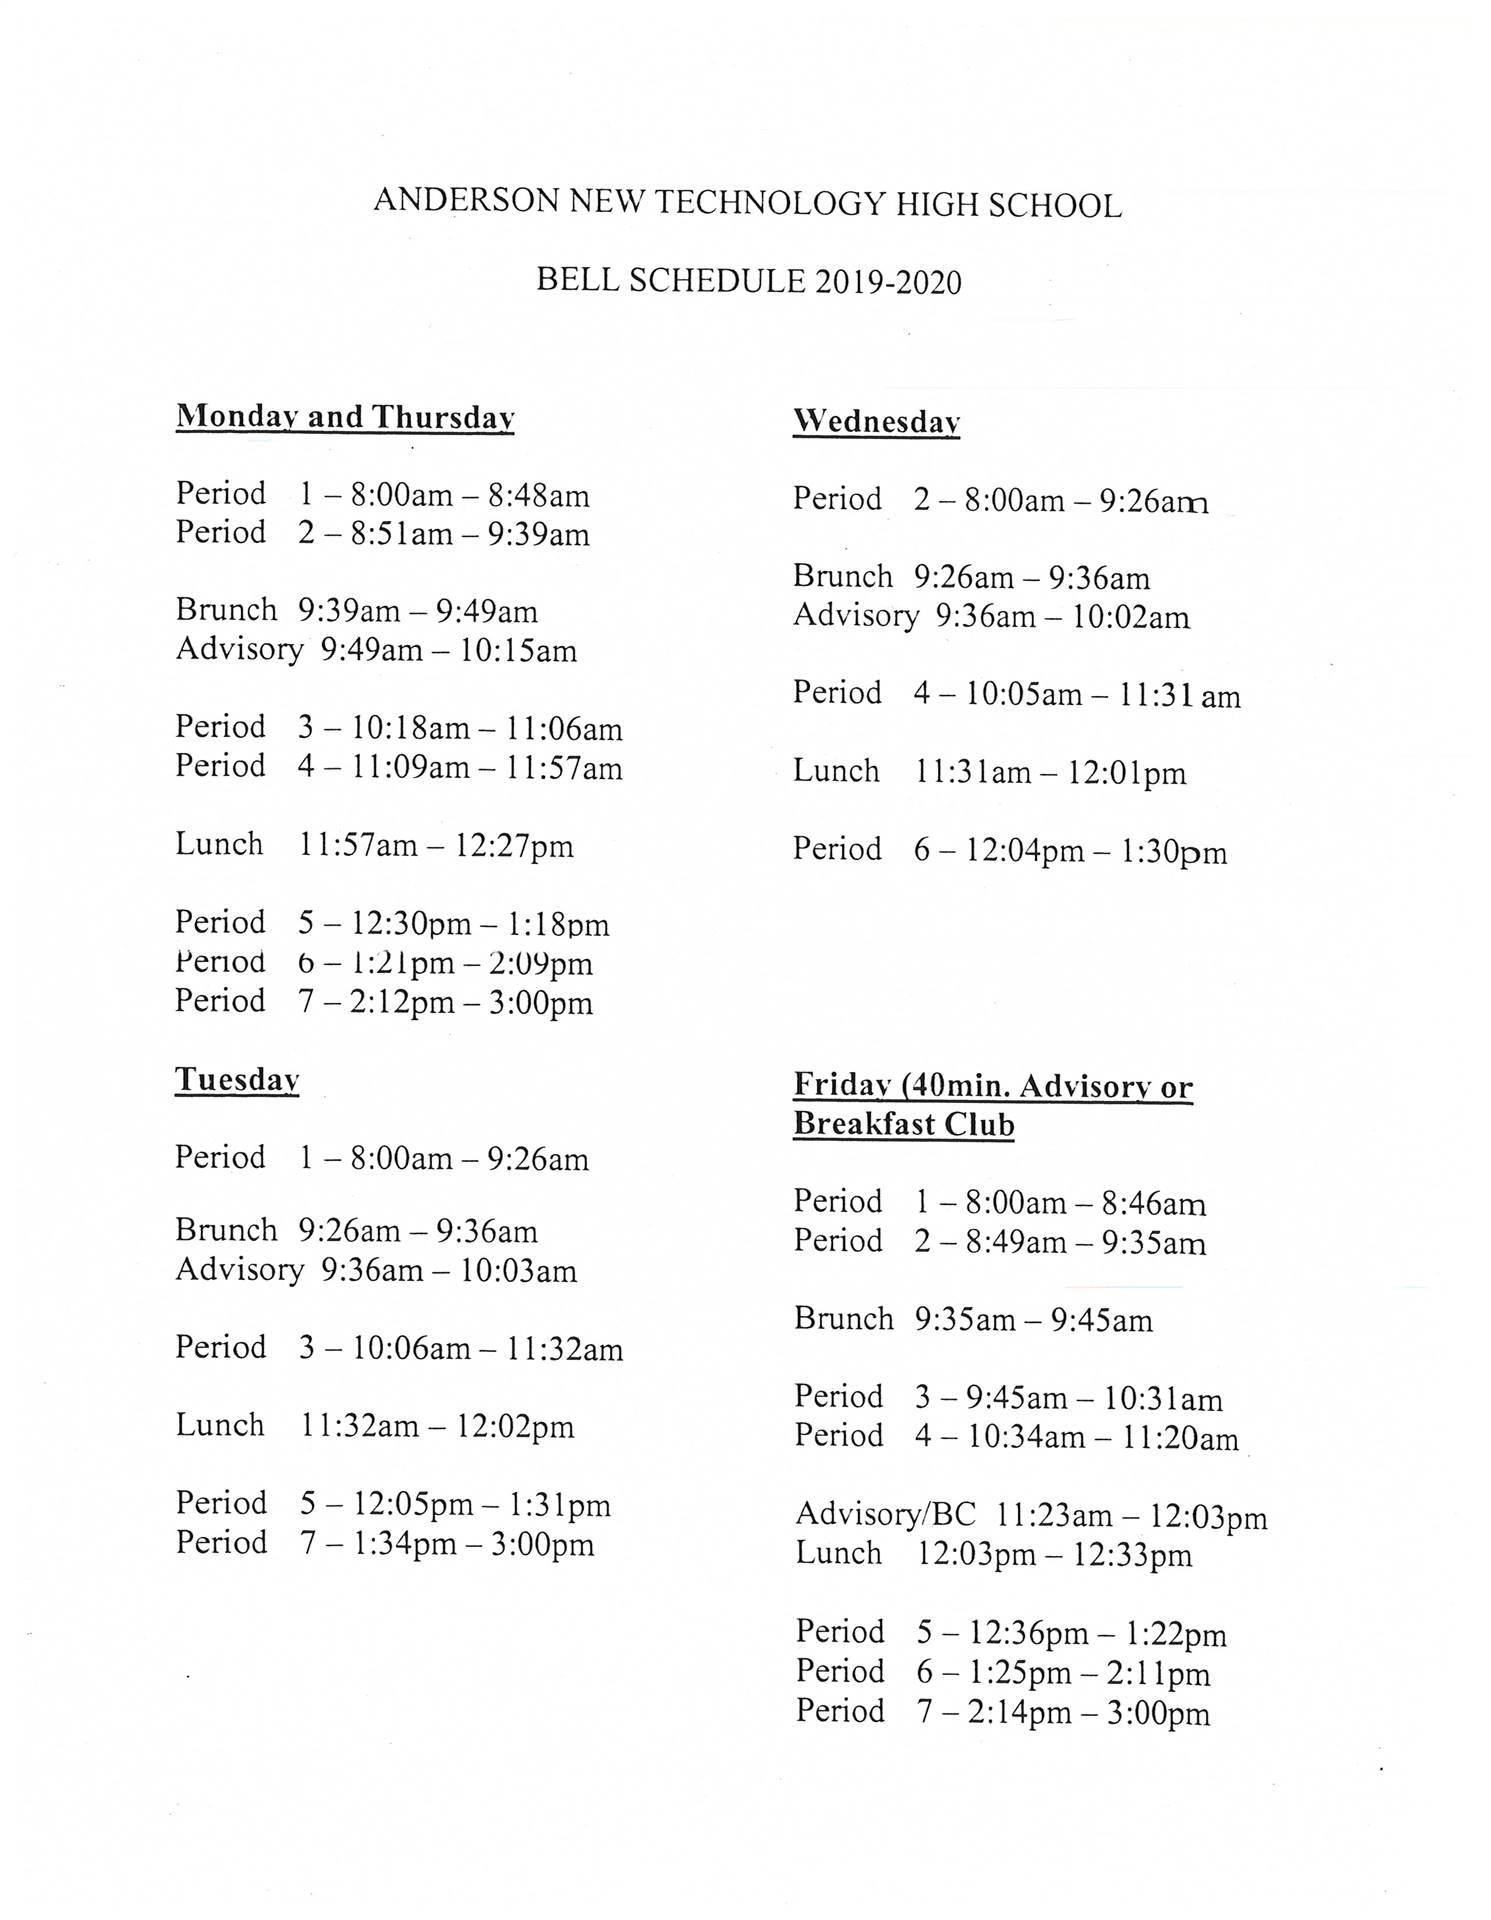 Bell Schedule 19-20